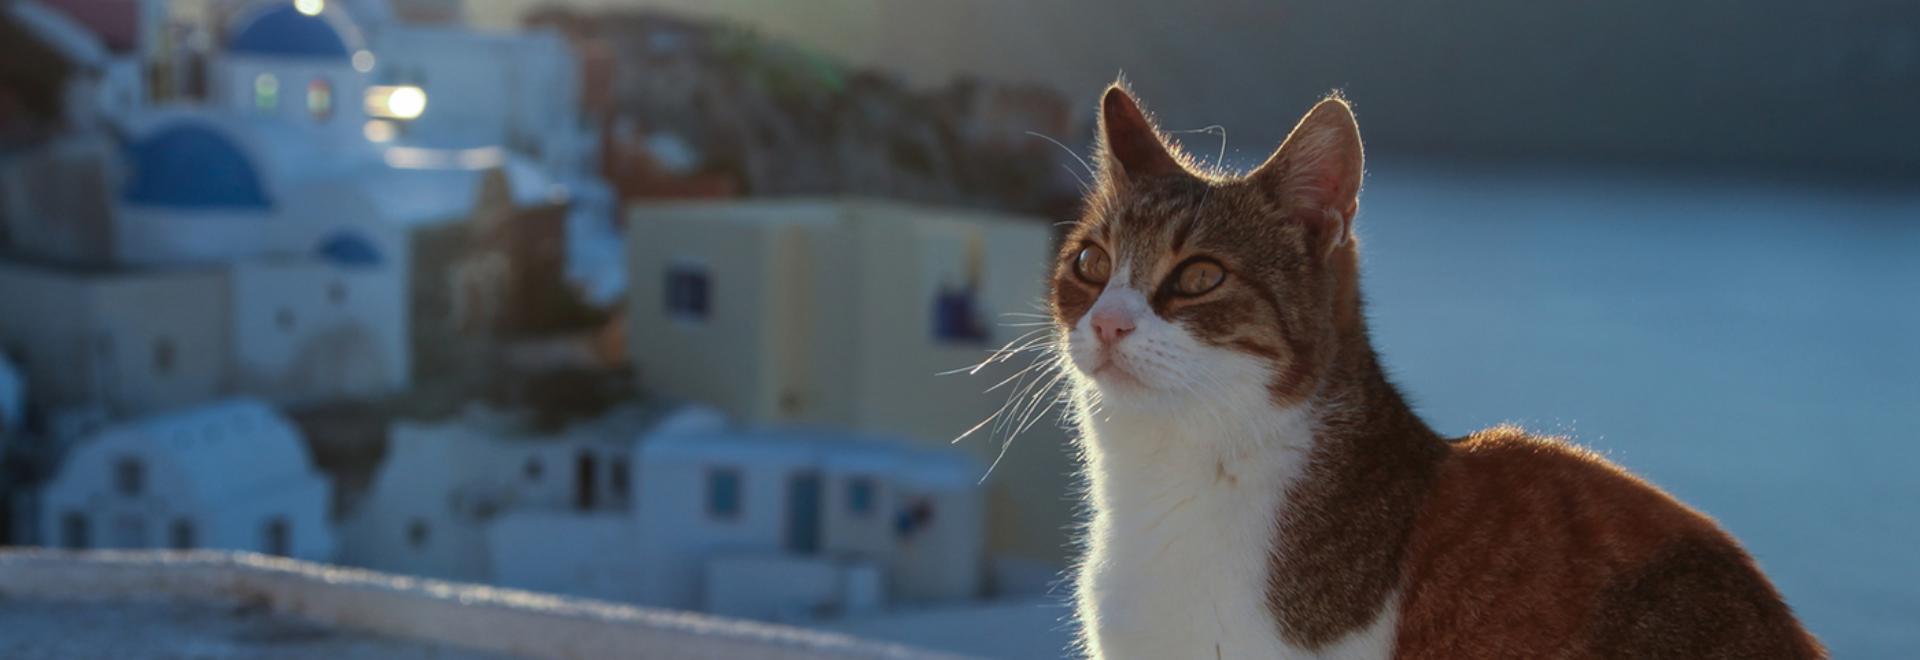 ISFM European Feline Congress 2020 | International Cat Care